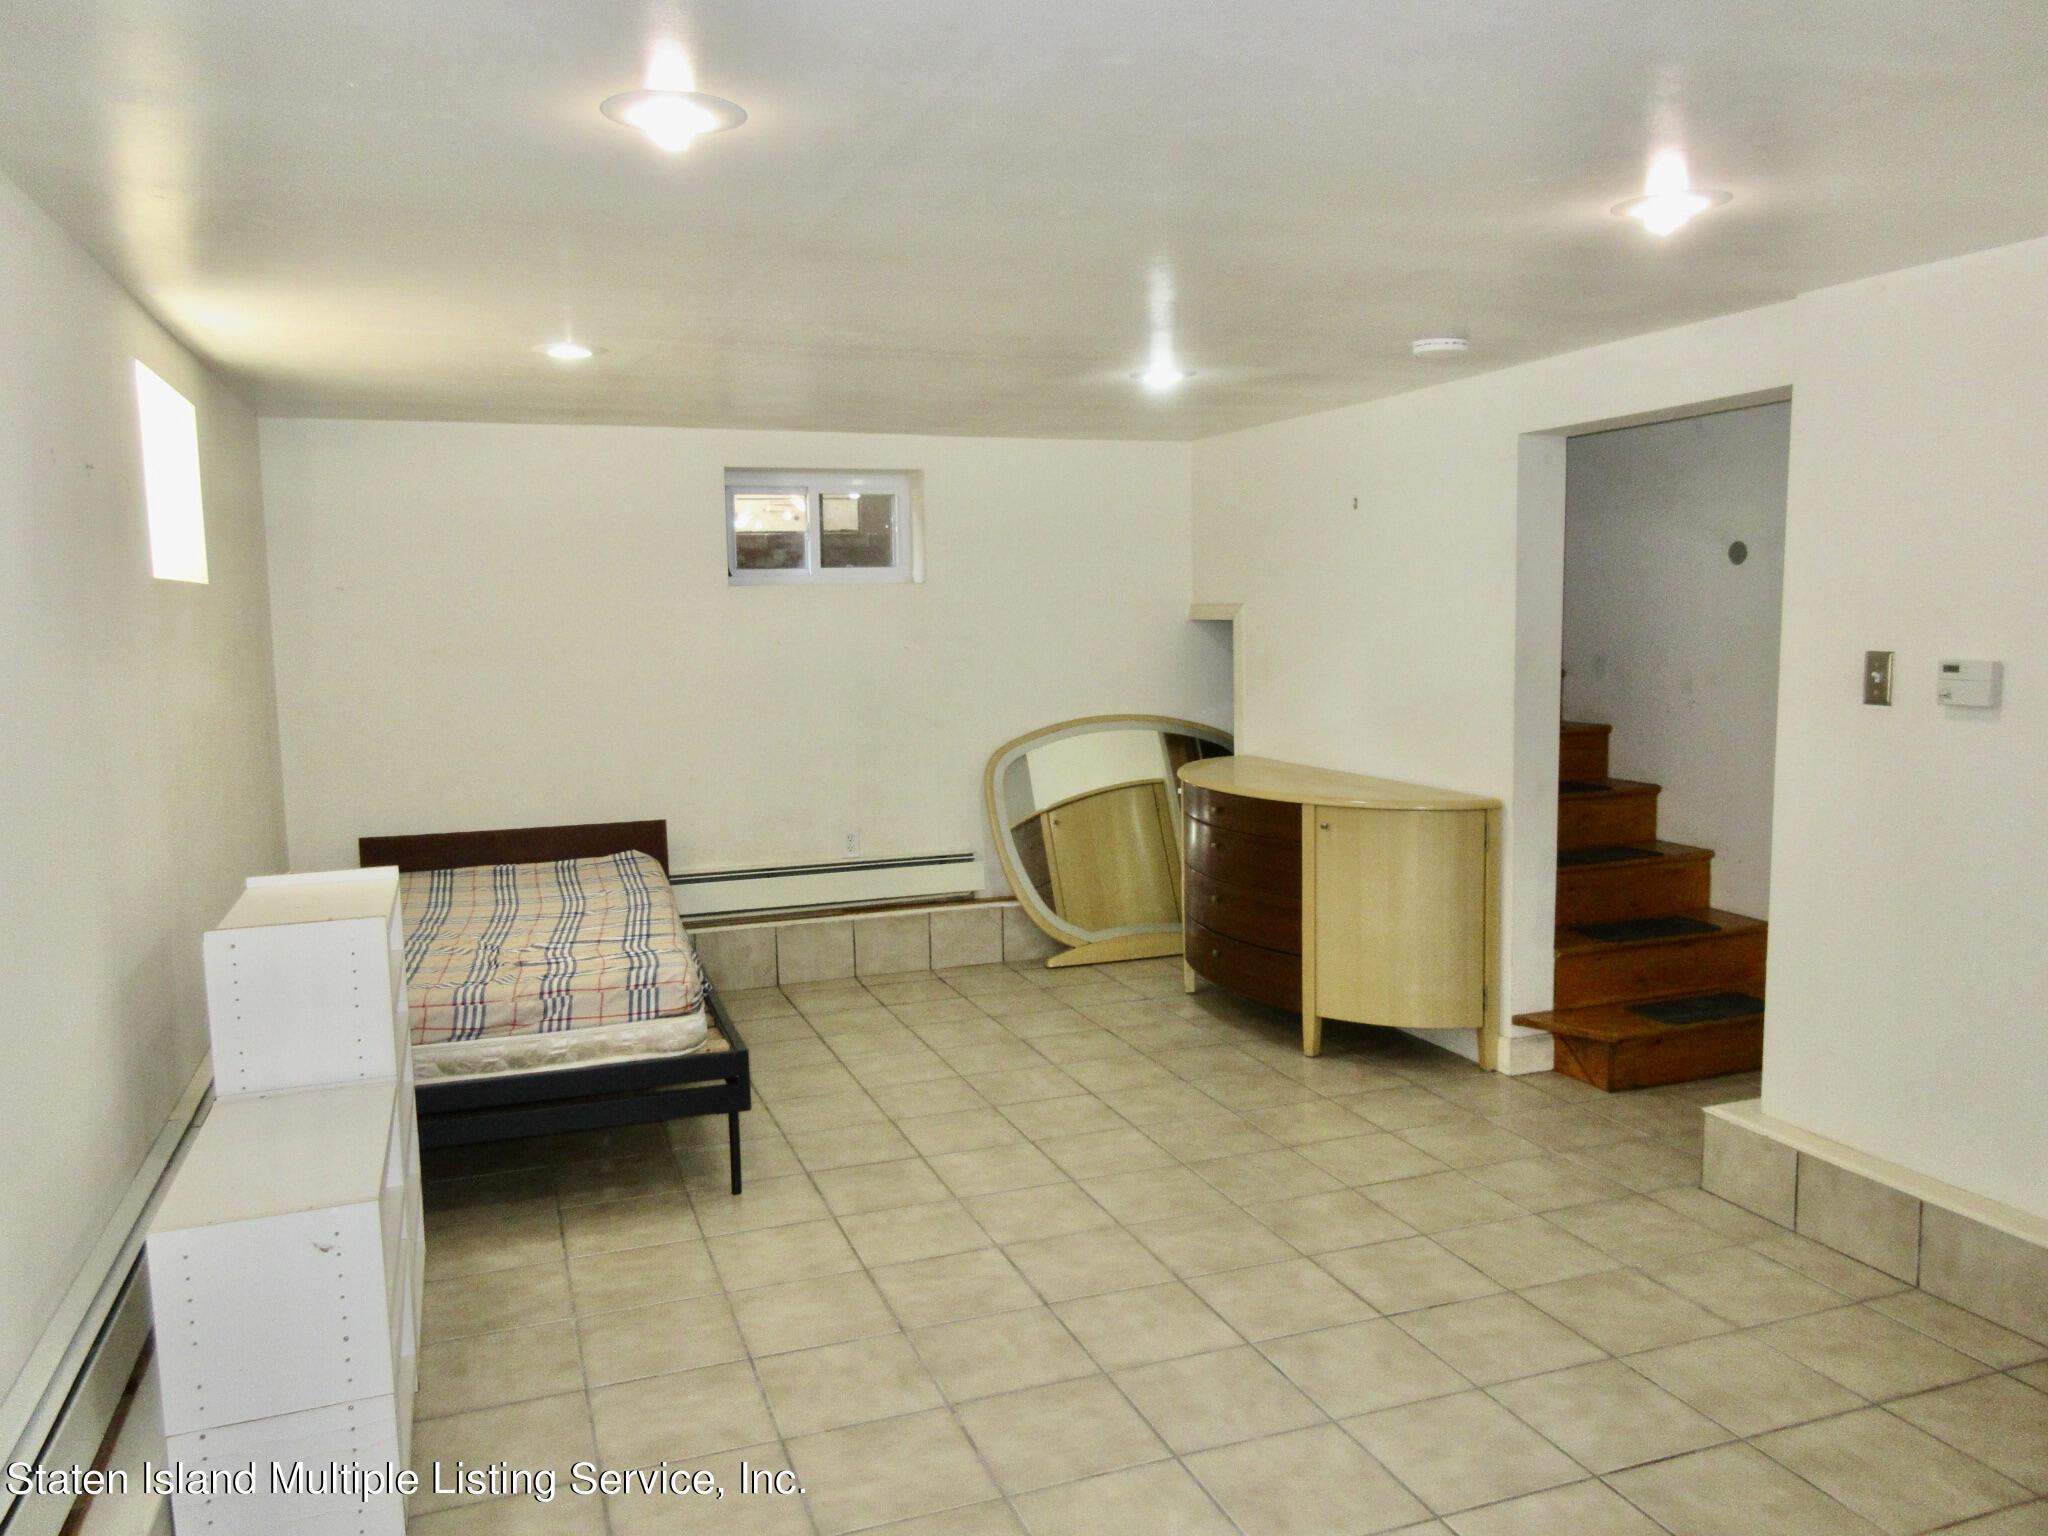 Two Family - Detached 89-91 David Street  Staten Island, NY 10308, MLS-1146516-28